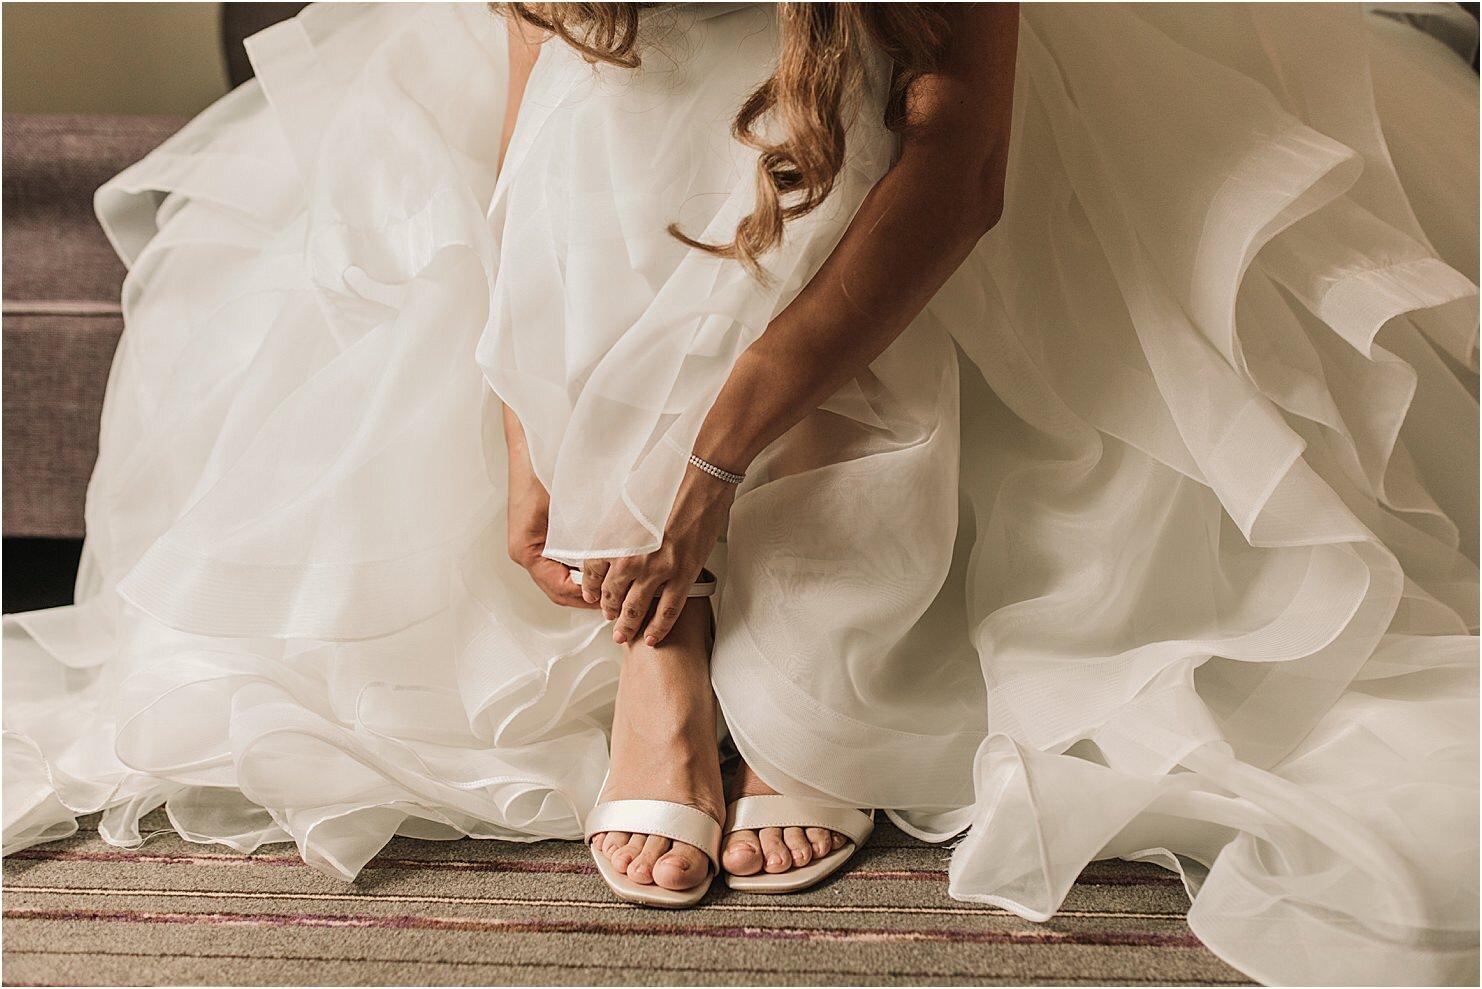 boda-de-cuento-en-castillo-boda-en-londres-32.jpg